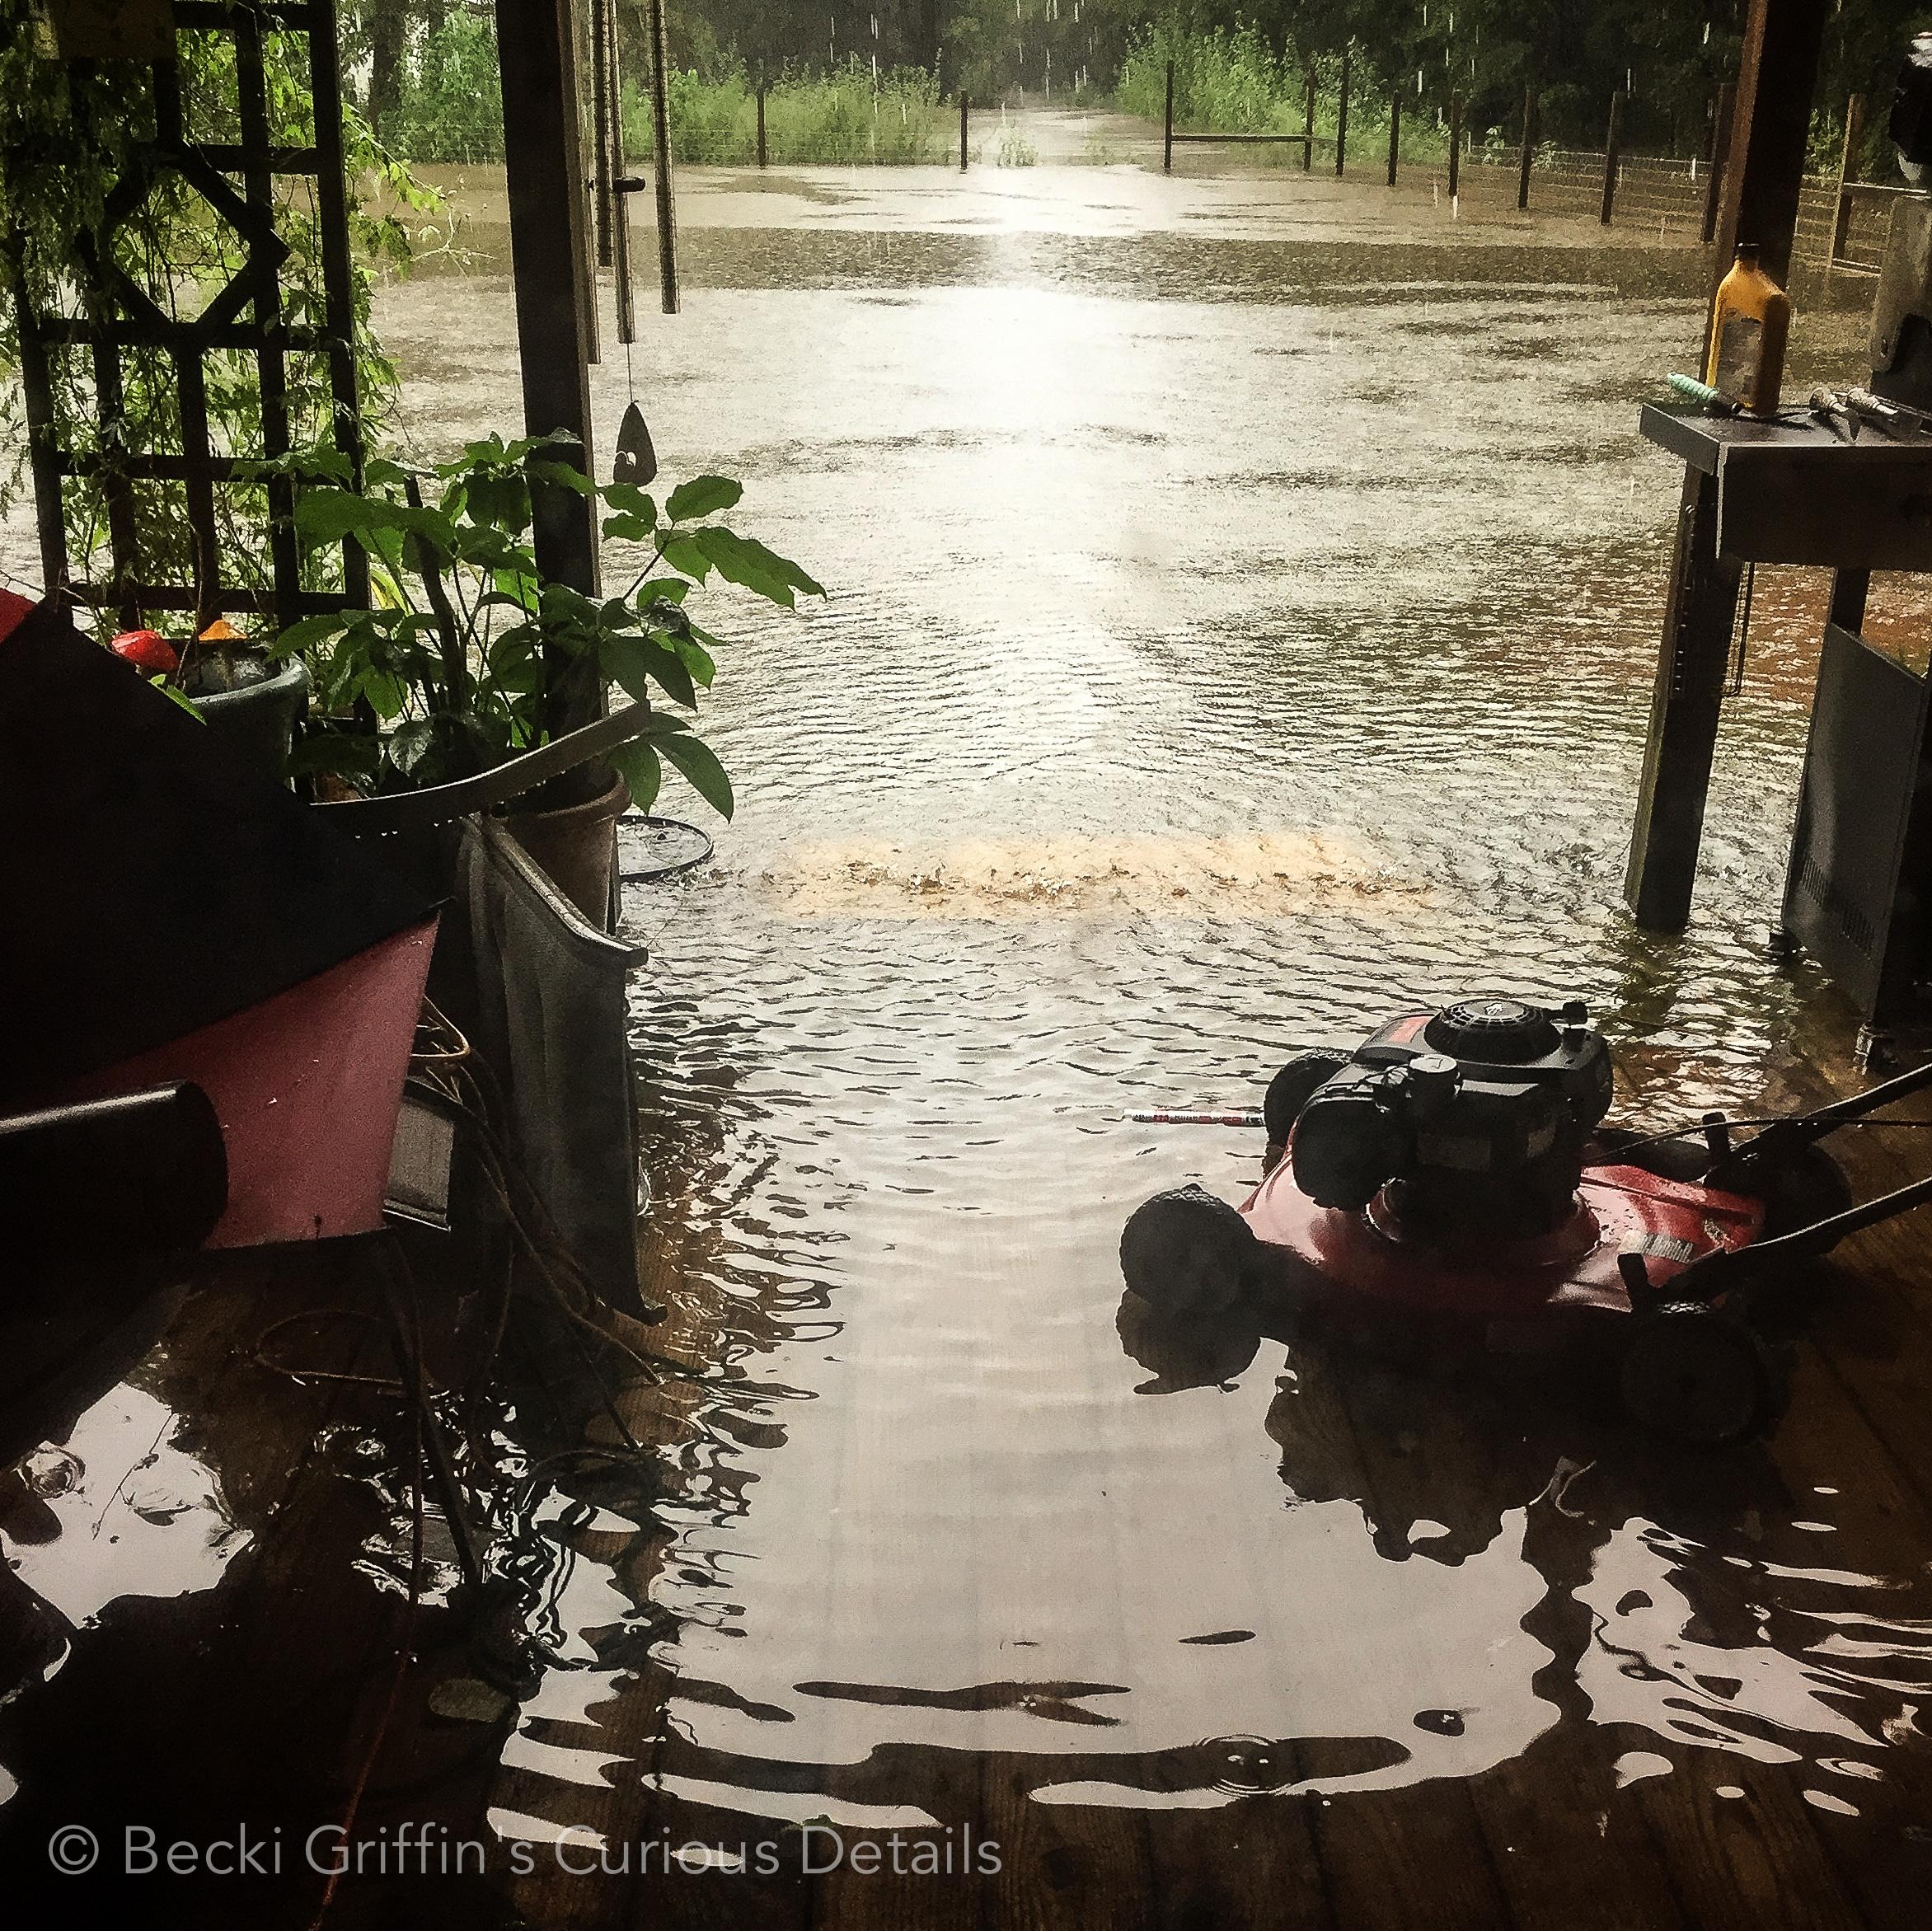 Becki Griffin's Curious Details Hurricane Harvey